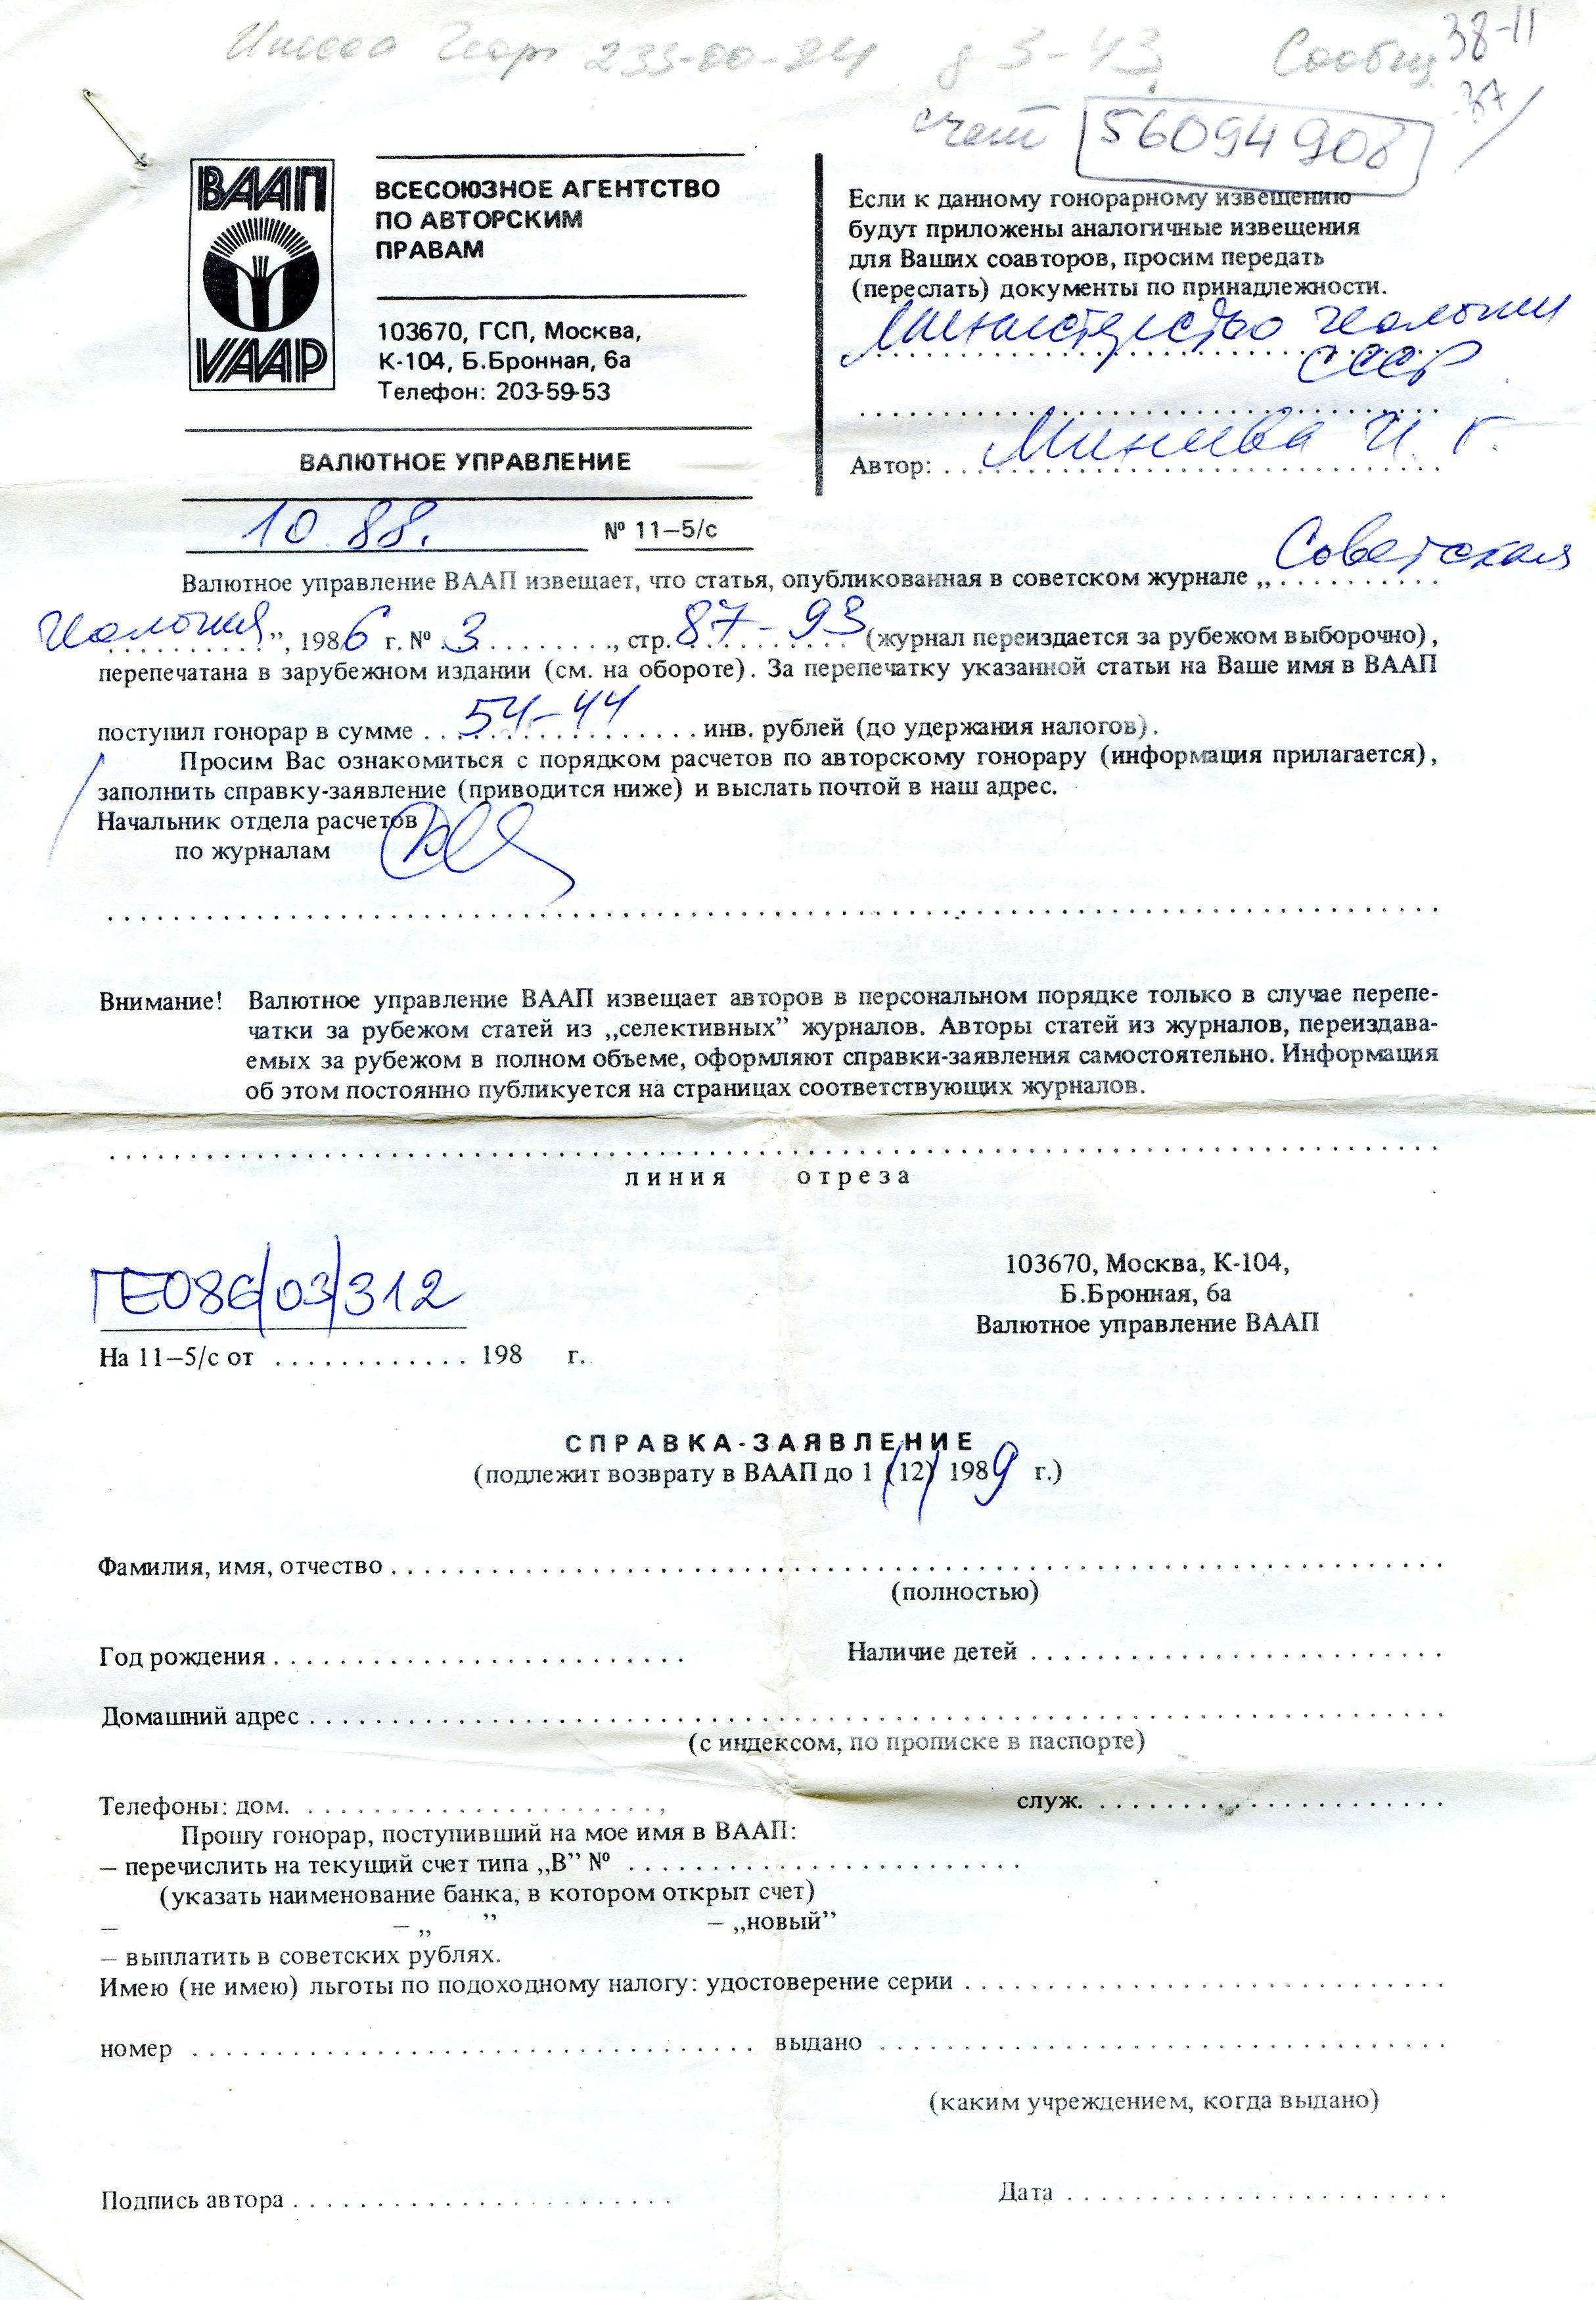 1988 ВААП_инв рубль001.jpg